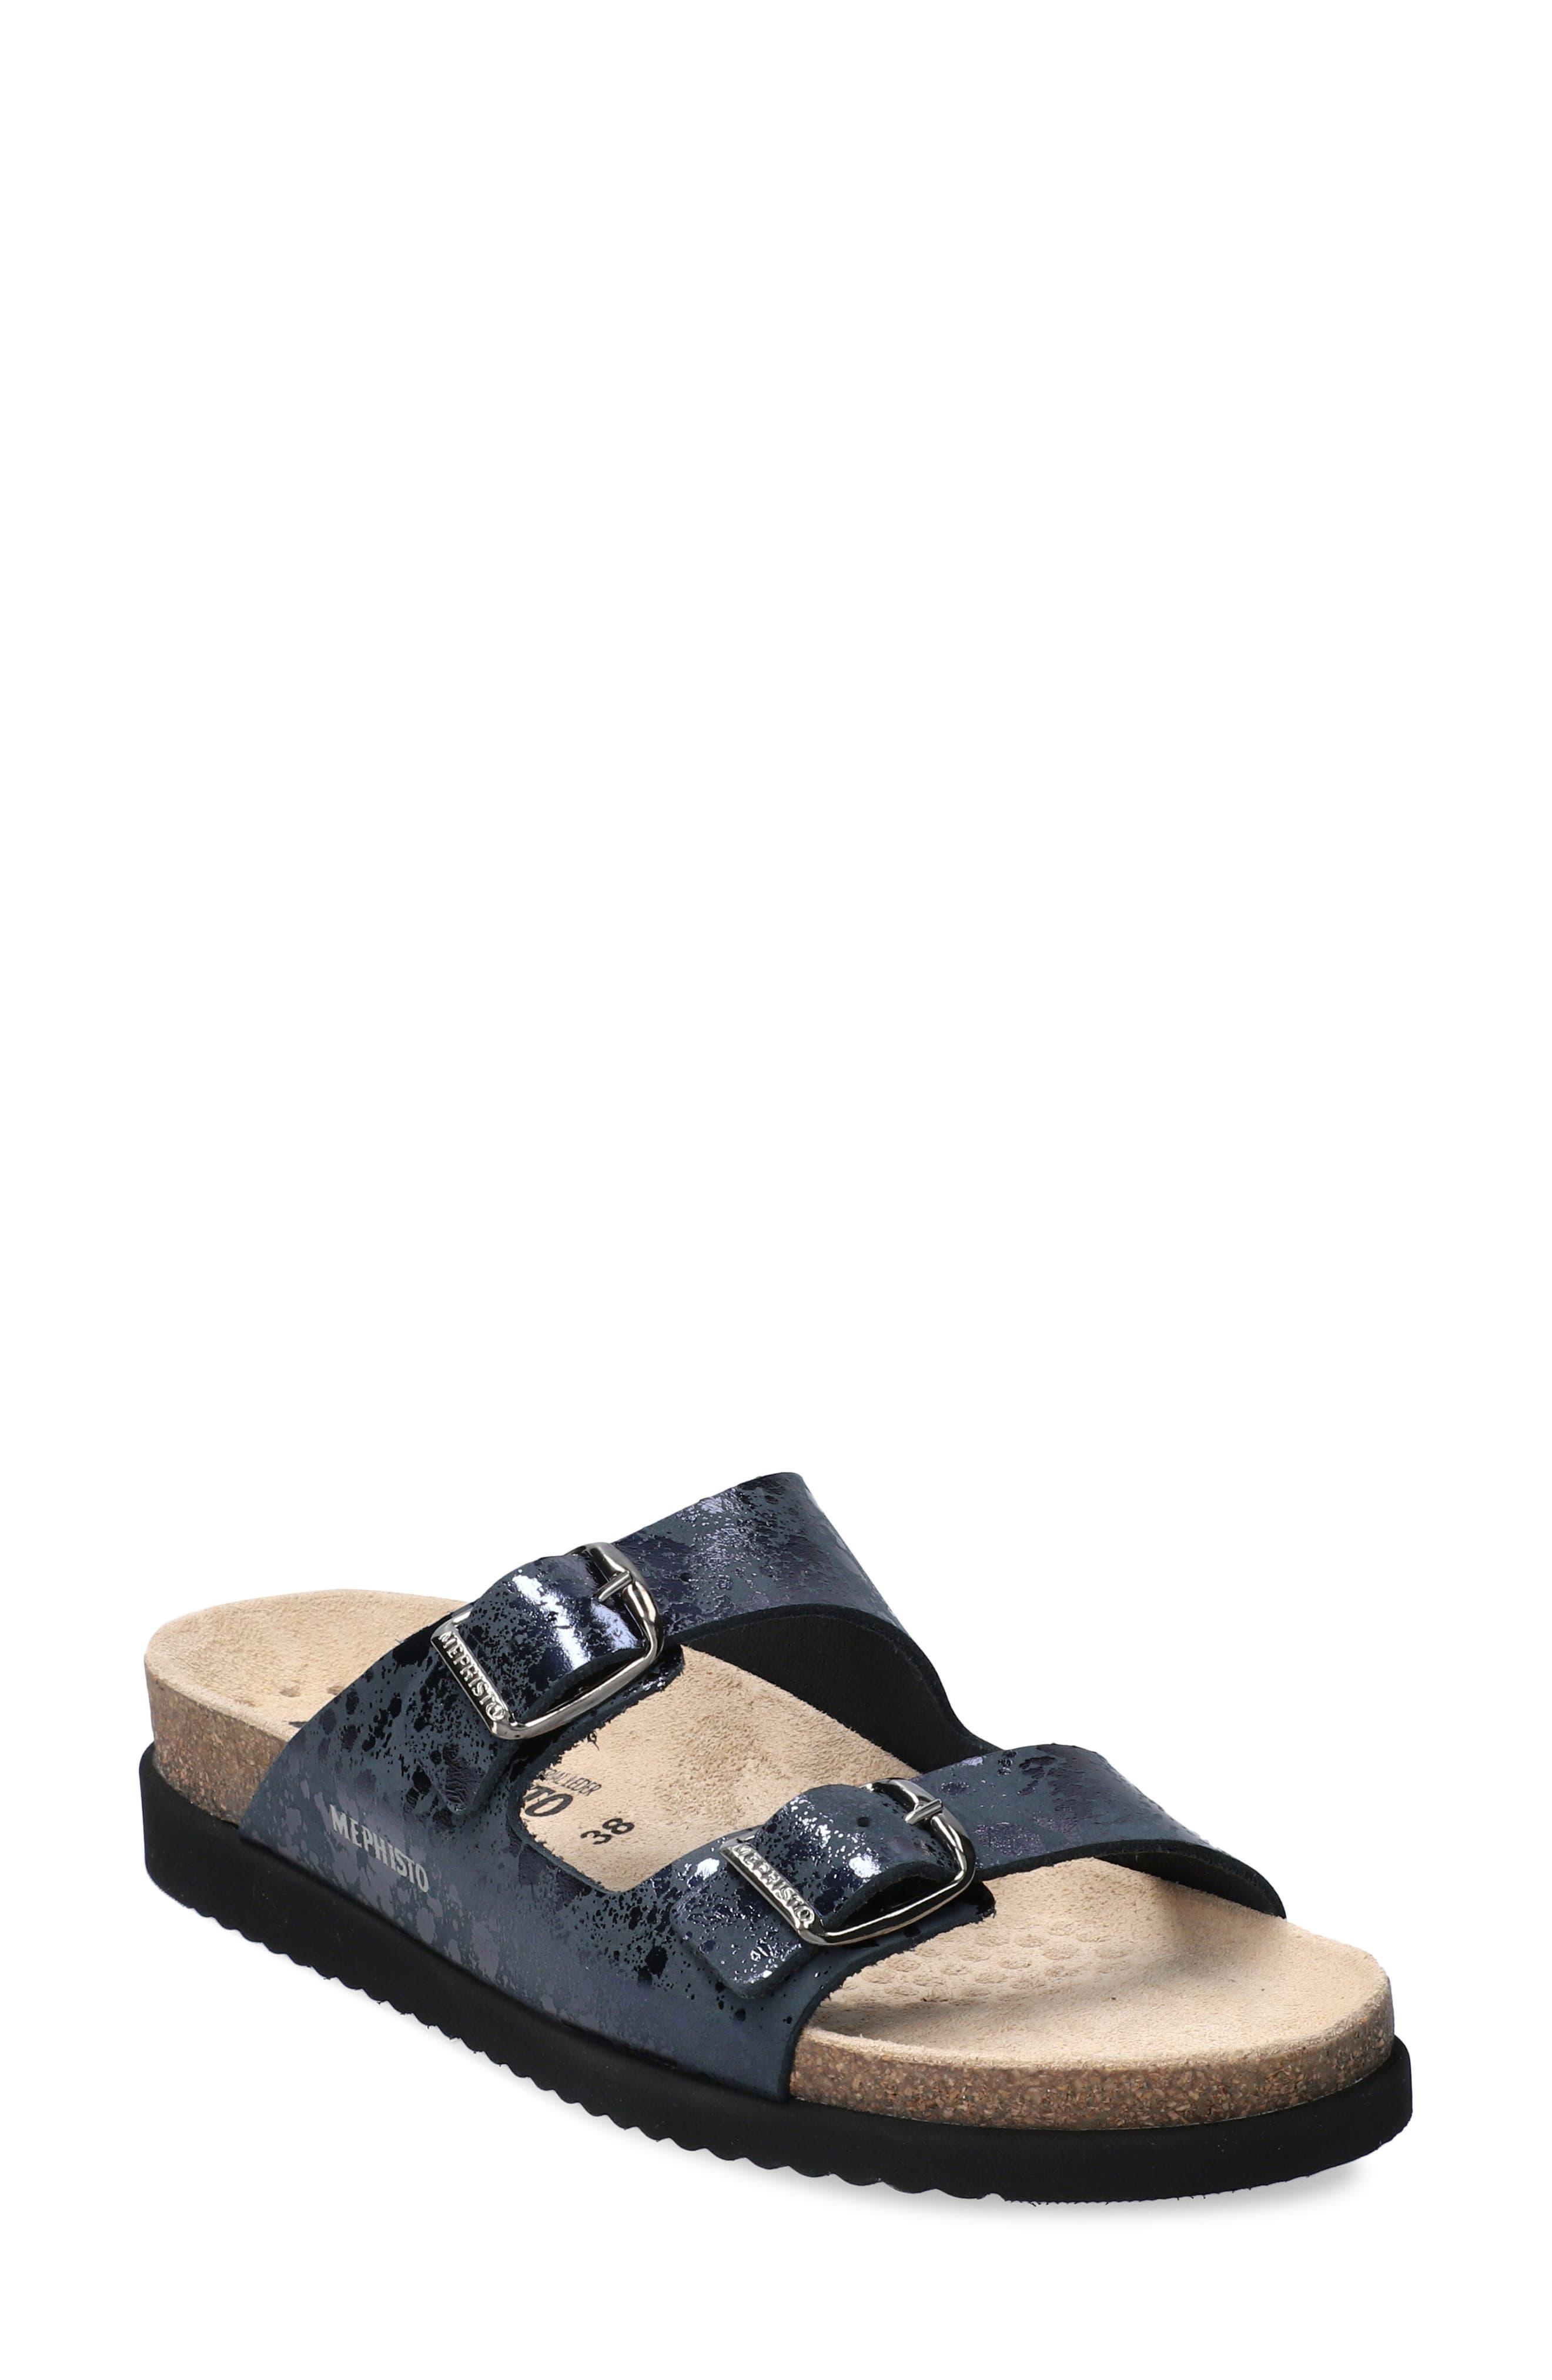 'Harmony' Slide Sandal